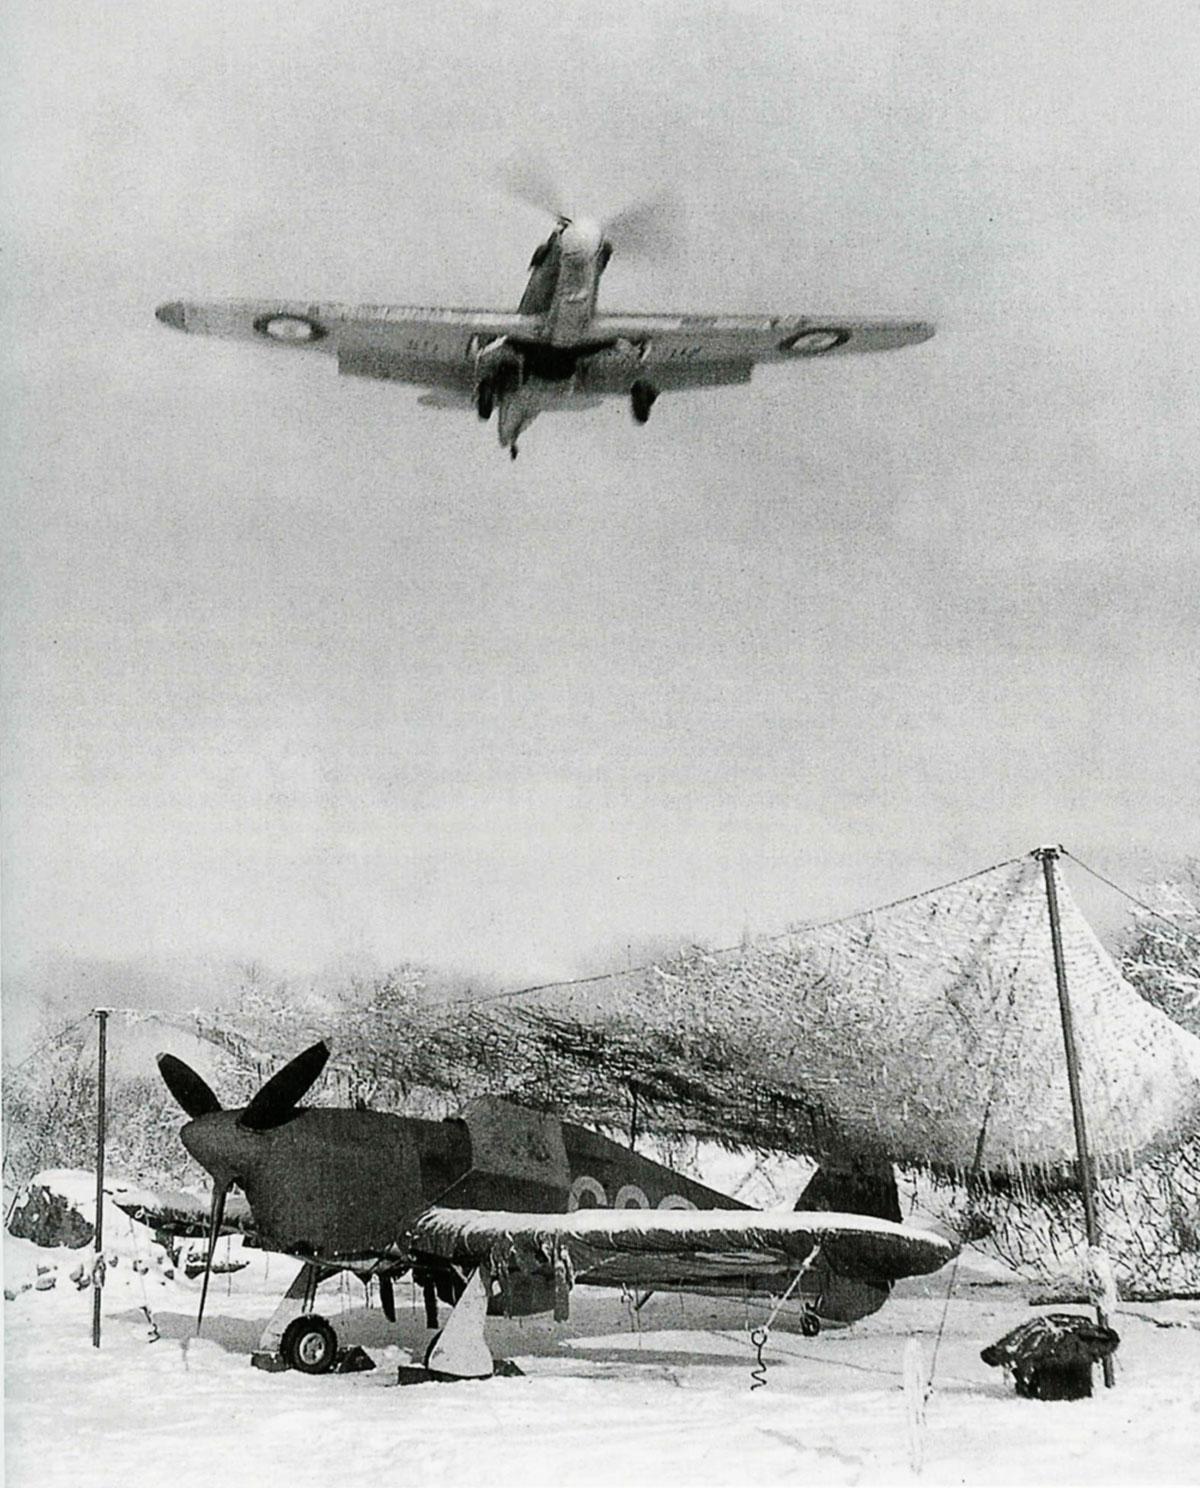 Hurricane IIb Trop RAF 151 Wing 134Sqn G037 Z5225 Vaenga Oct 1941 01